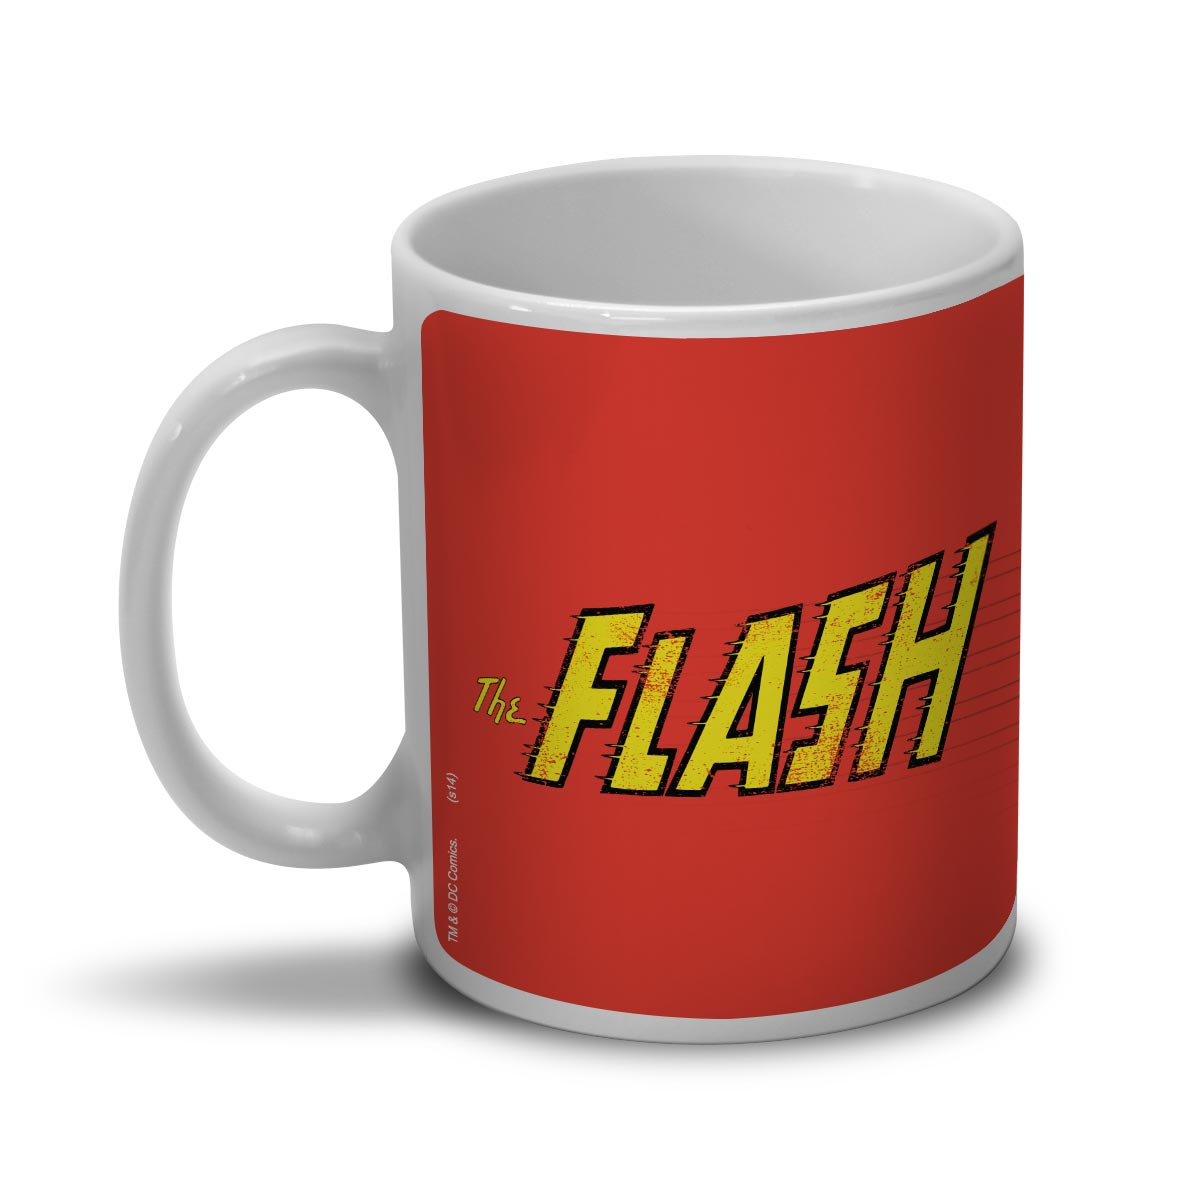 Caneca The Flash Running 2